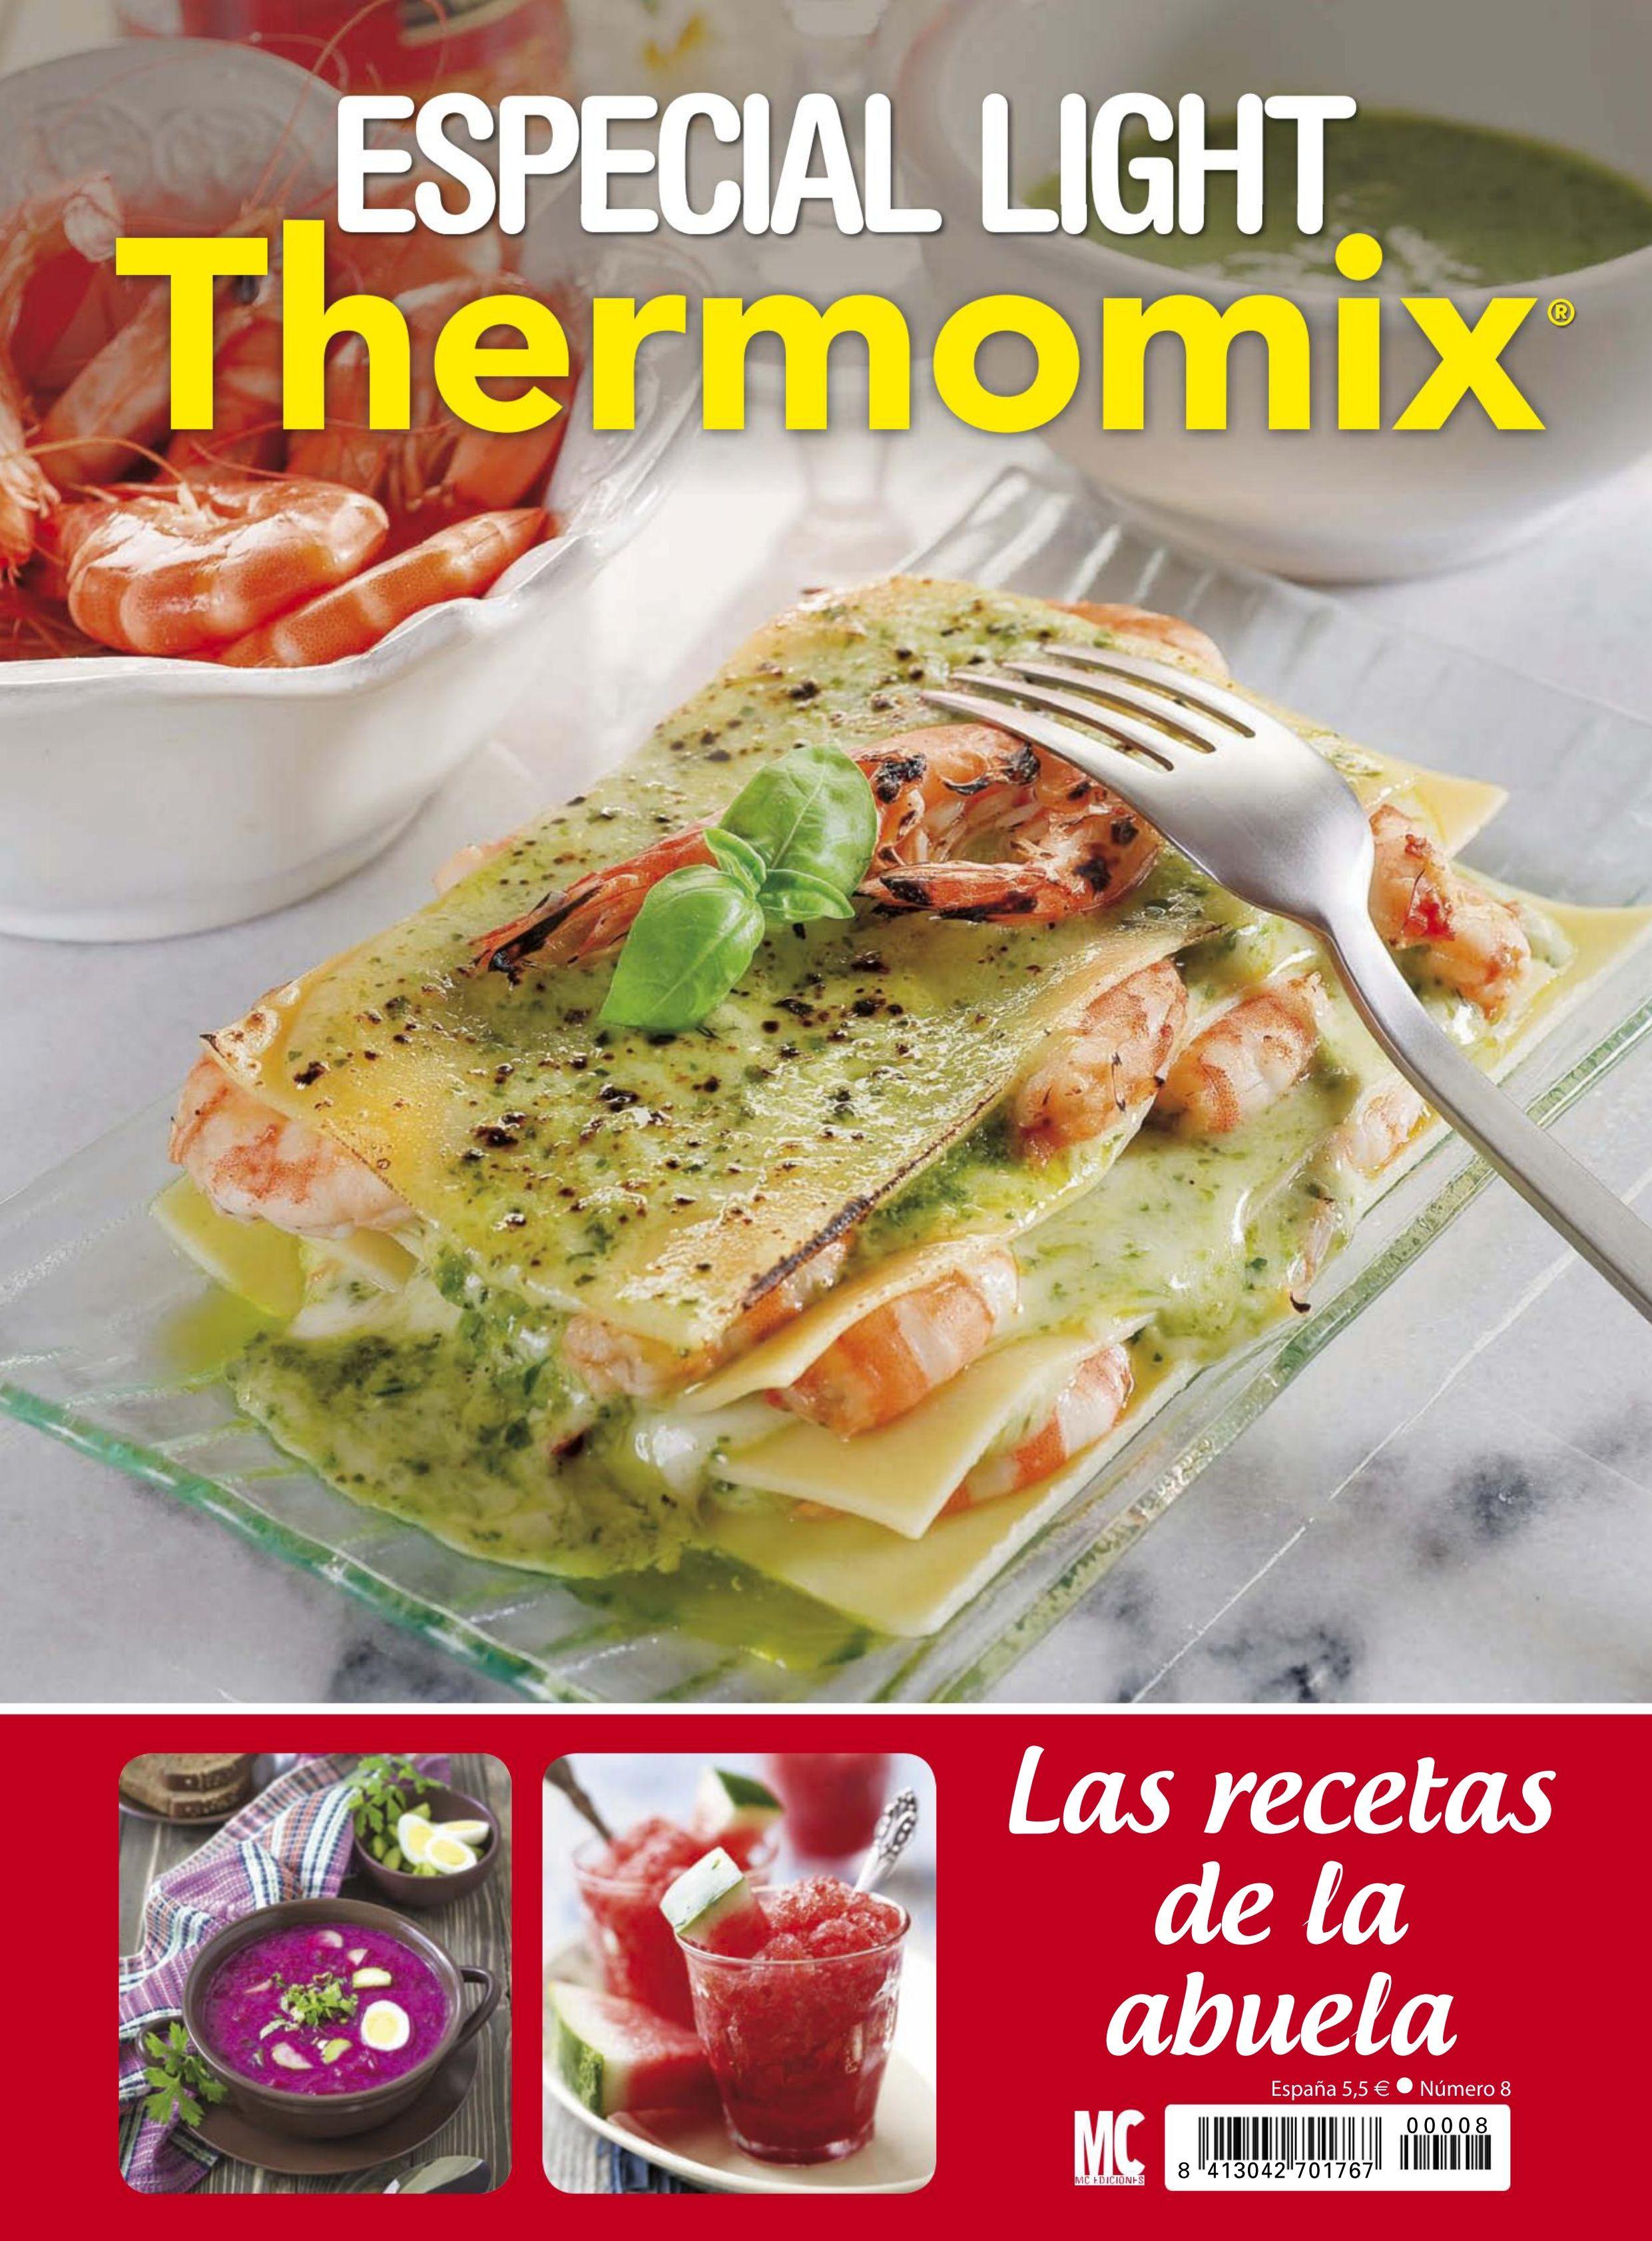 Especial Light Revista Thermomix Thermomix Recetas